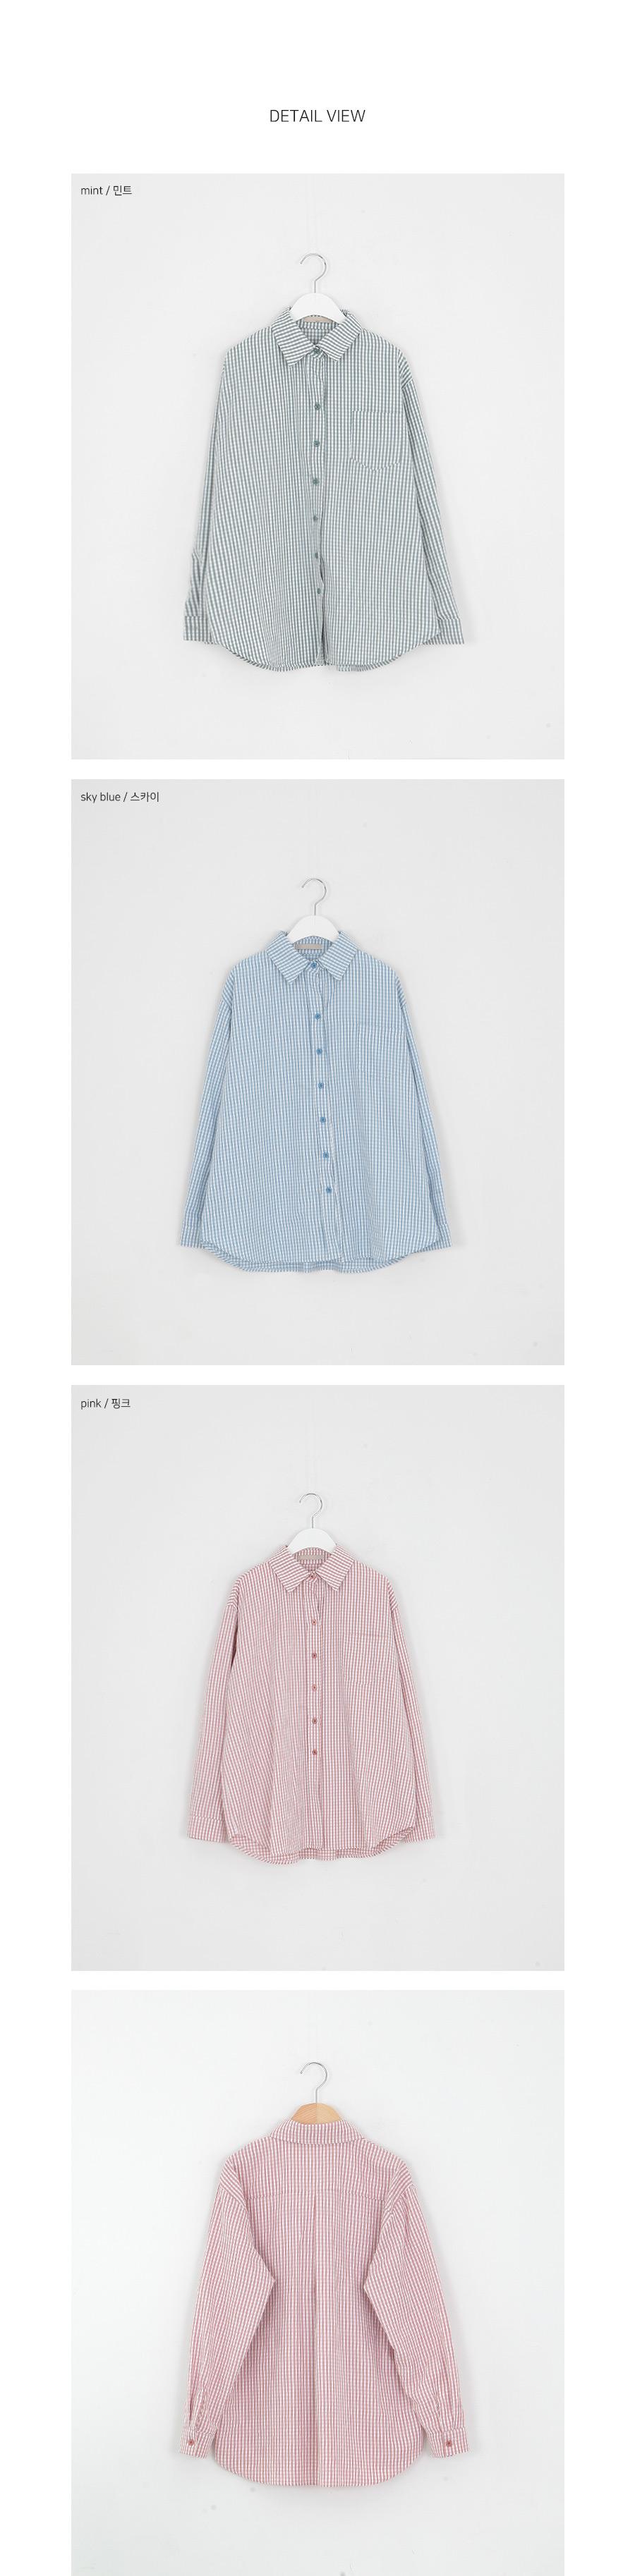 SALE) fresh check high school basic shirt